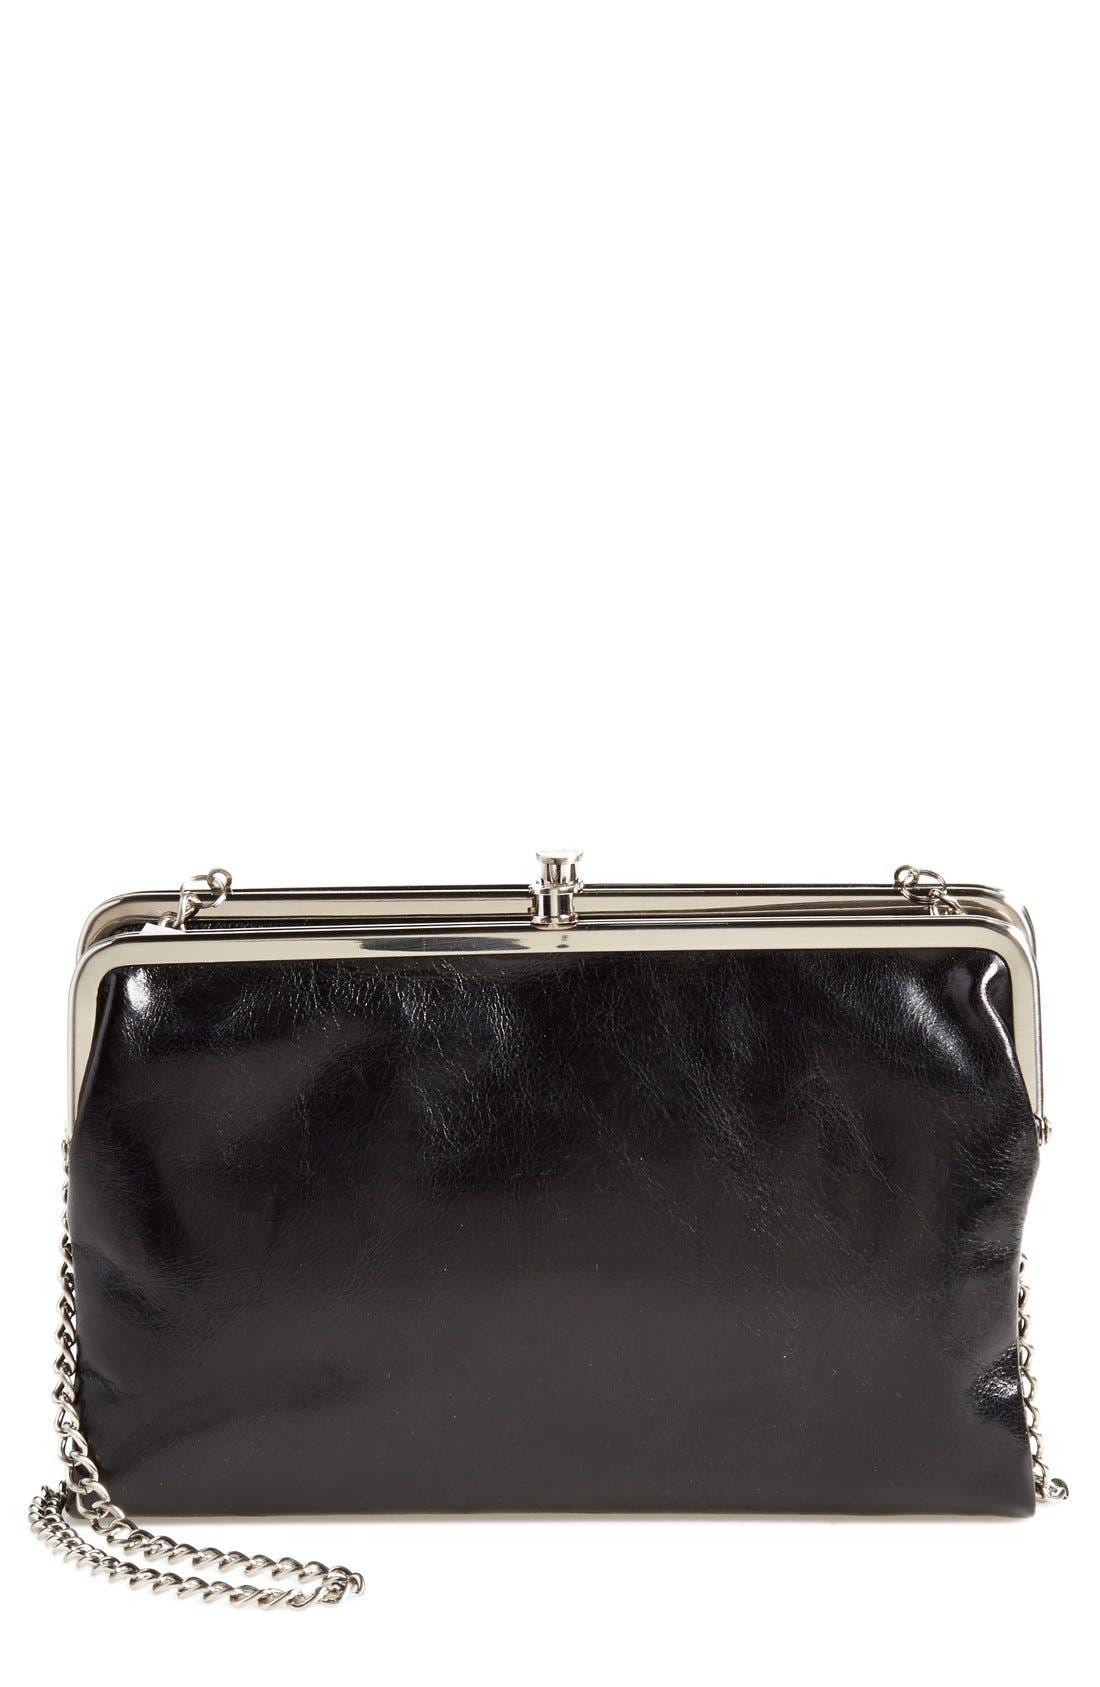 'Vintage Leanne' Leather Crossbody Bag,                             Main thumbnail 1, color,                             001